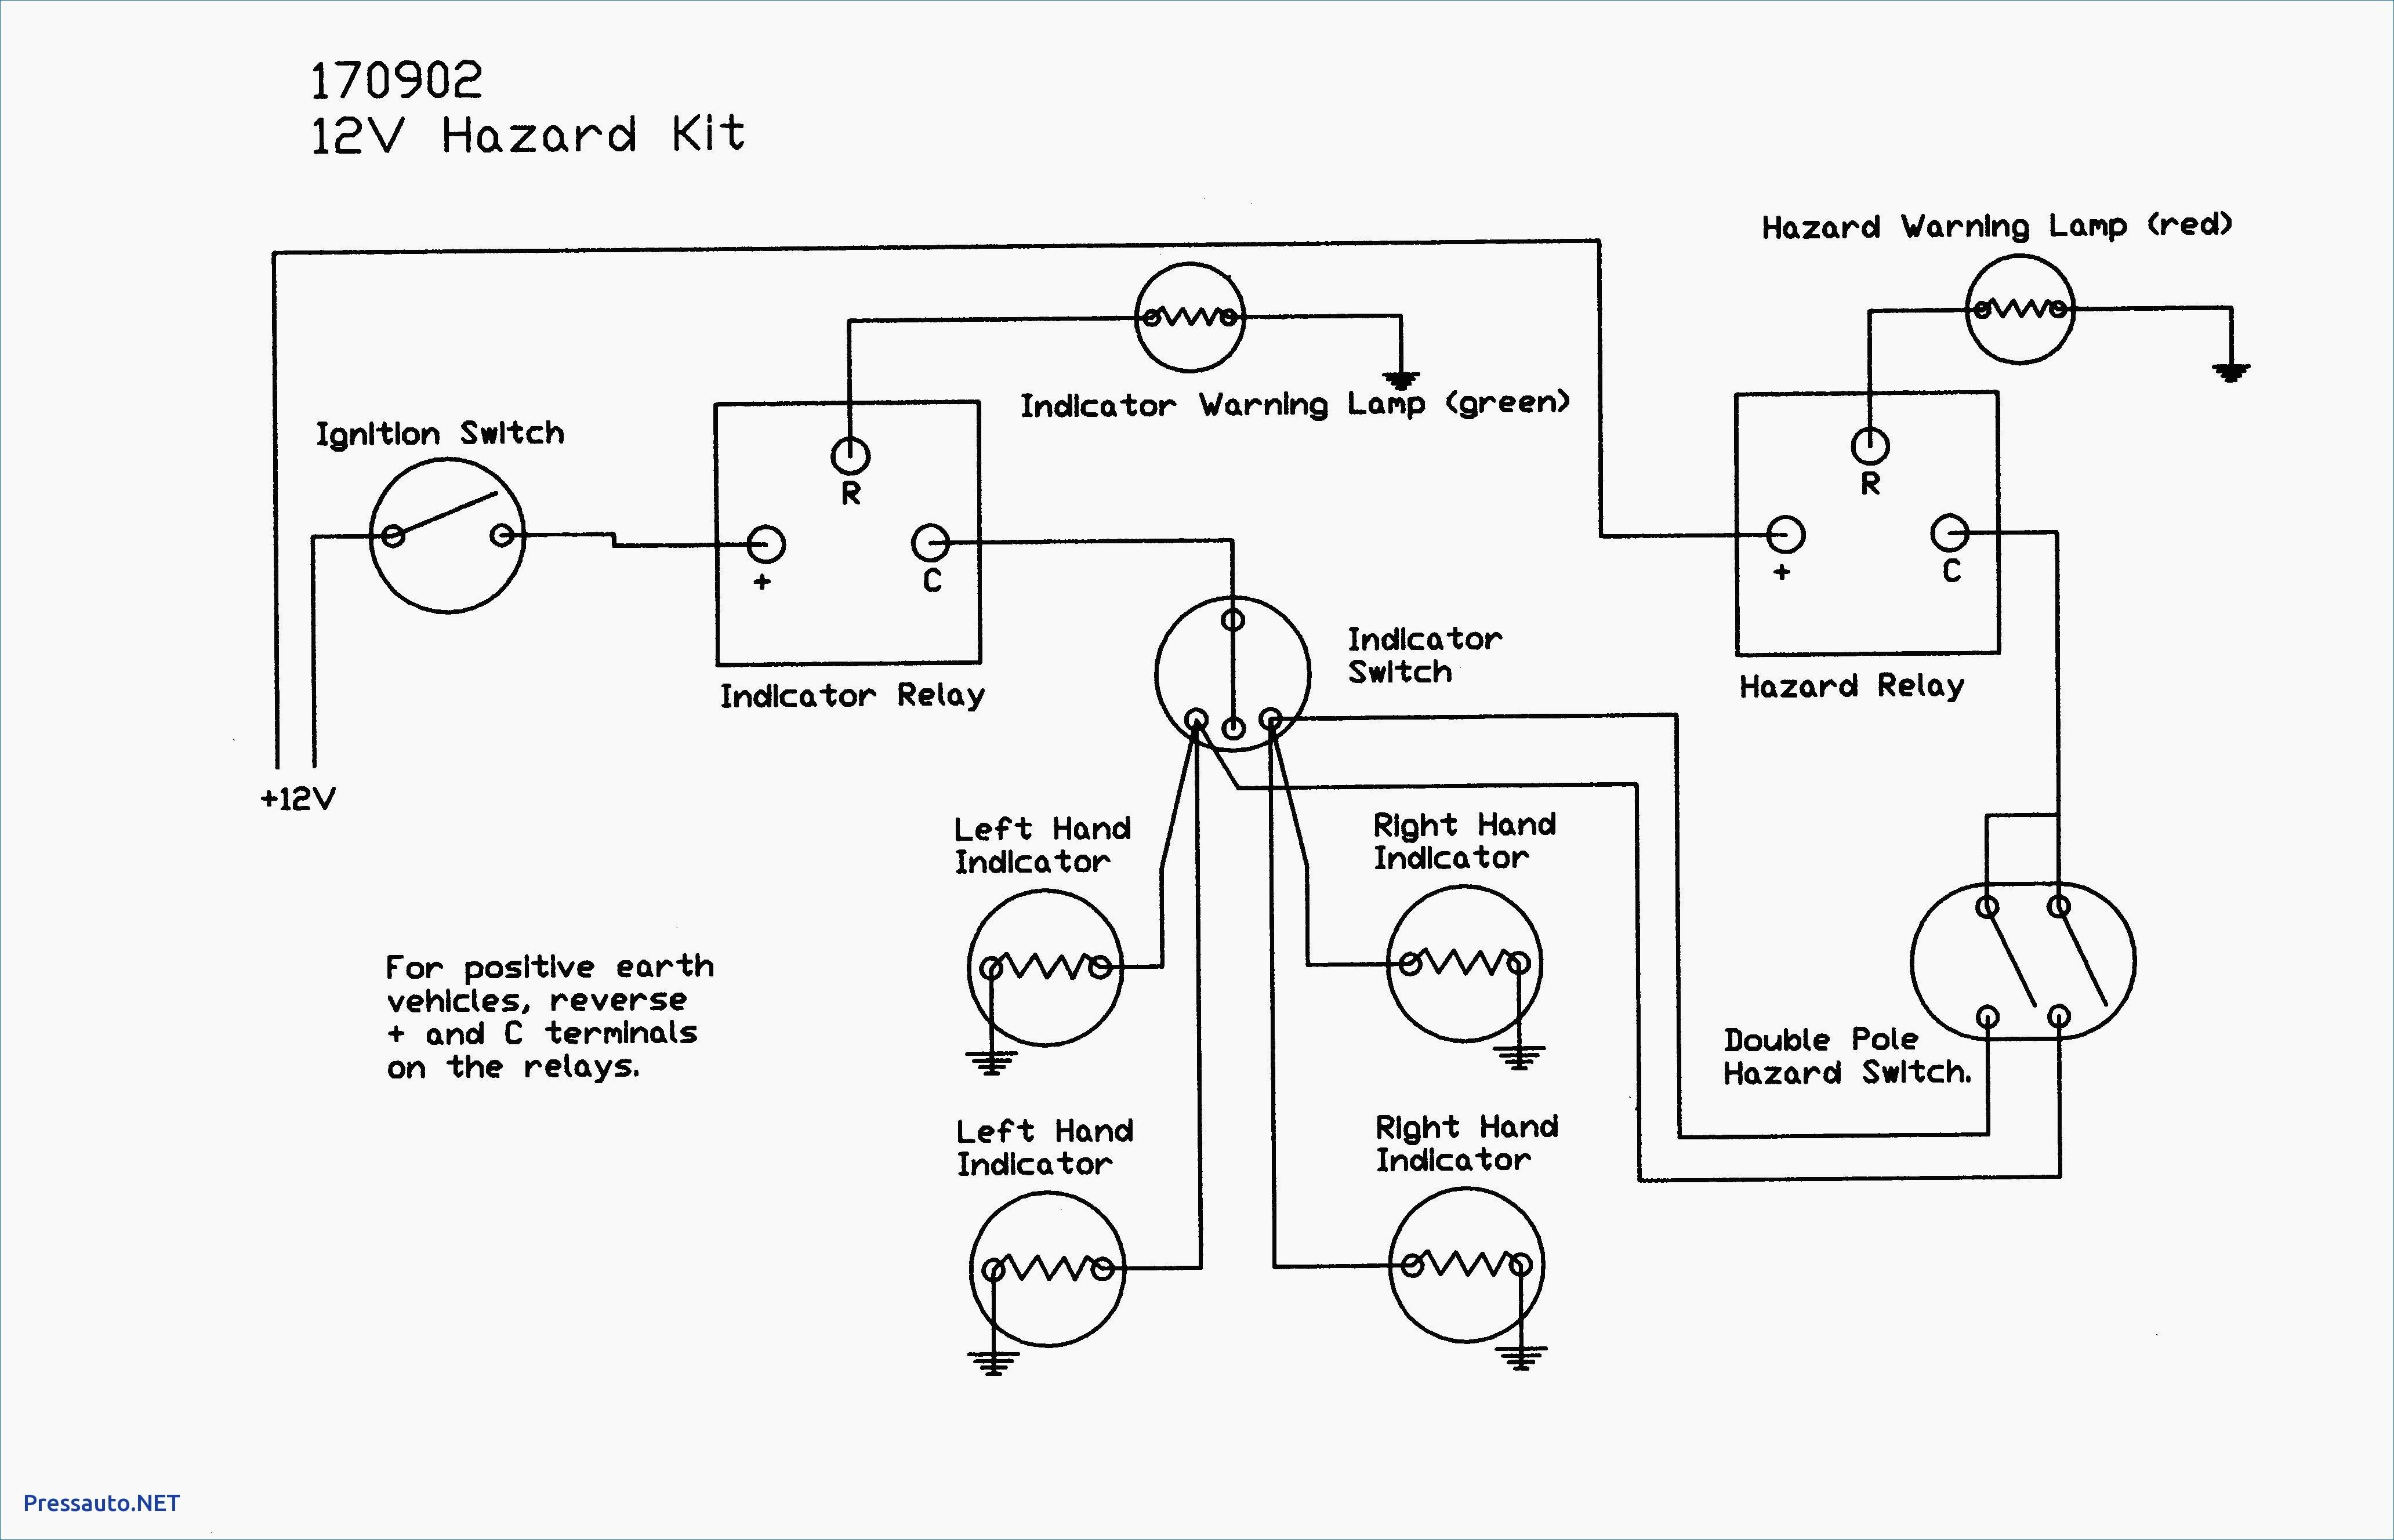 Car Air Horn Wiring Diagram Concer Biz In - Wiring Diagrams - Air Horns Wiring Diagram